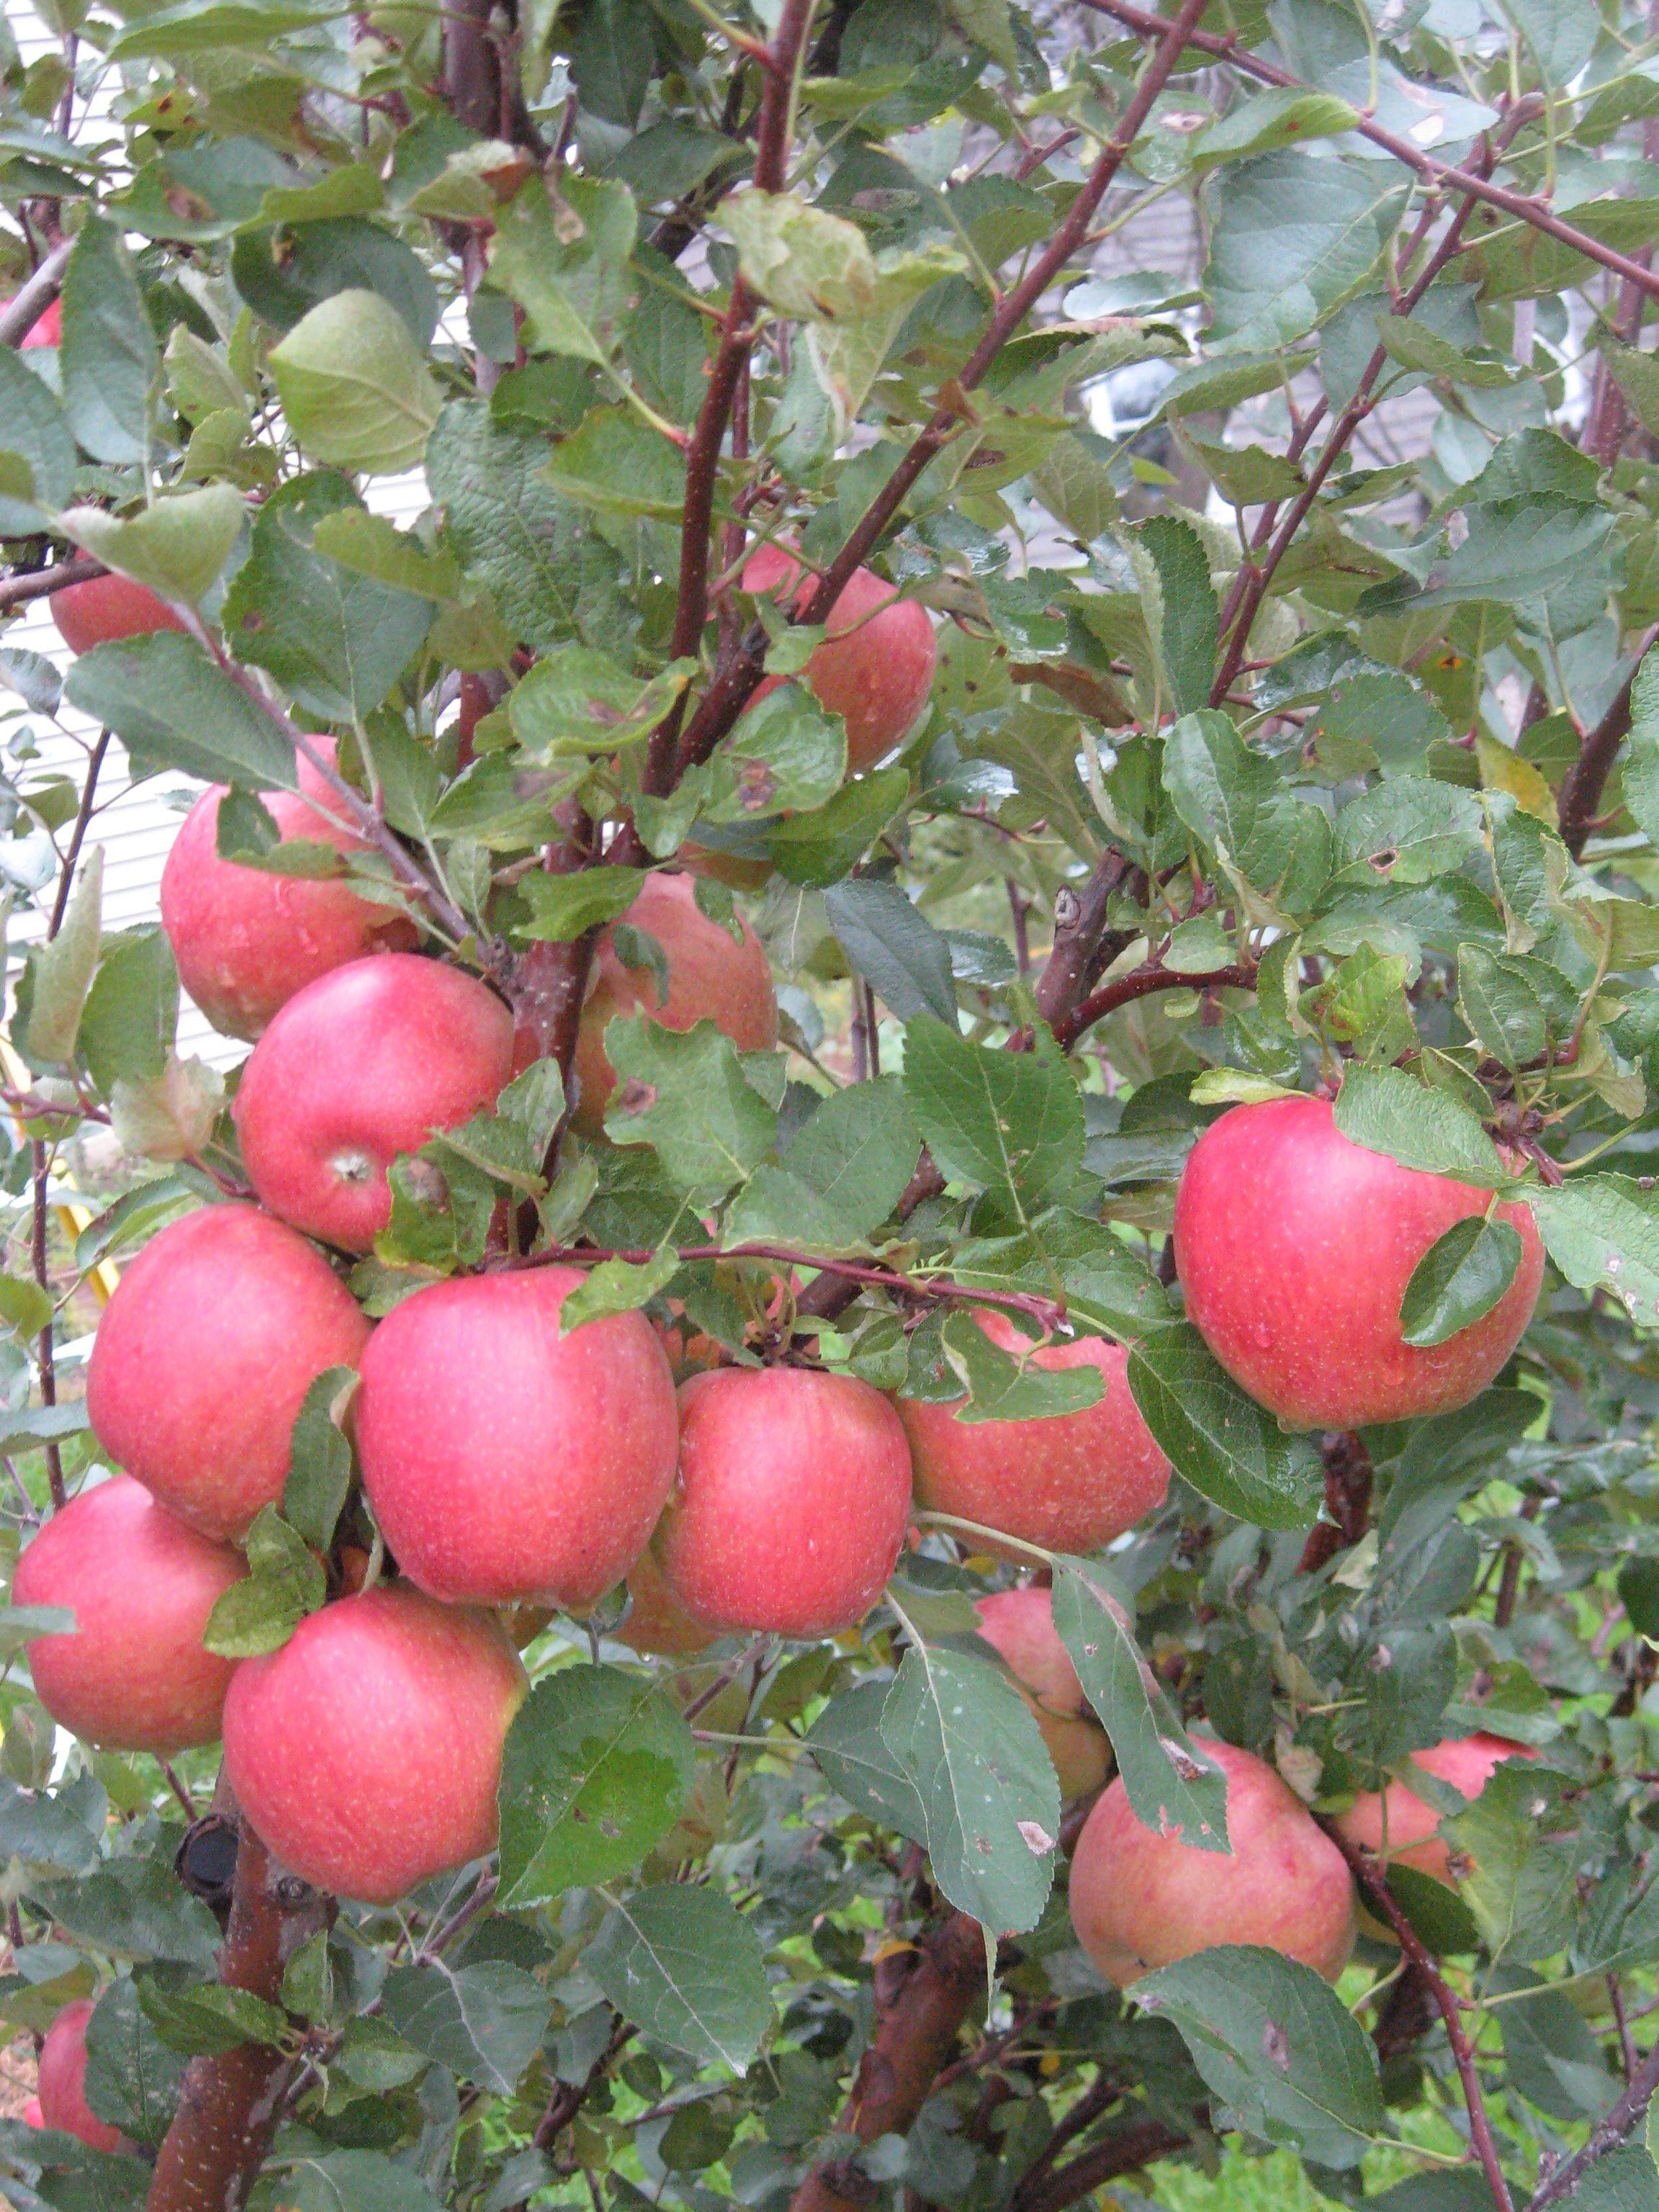 Suncrisp Apples On Tree Apple Tree Apple Garden Red Apple